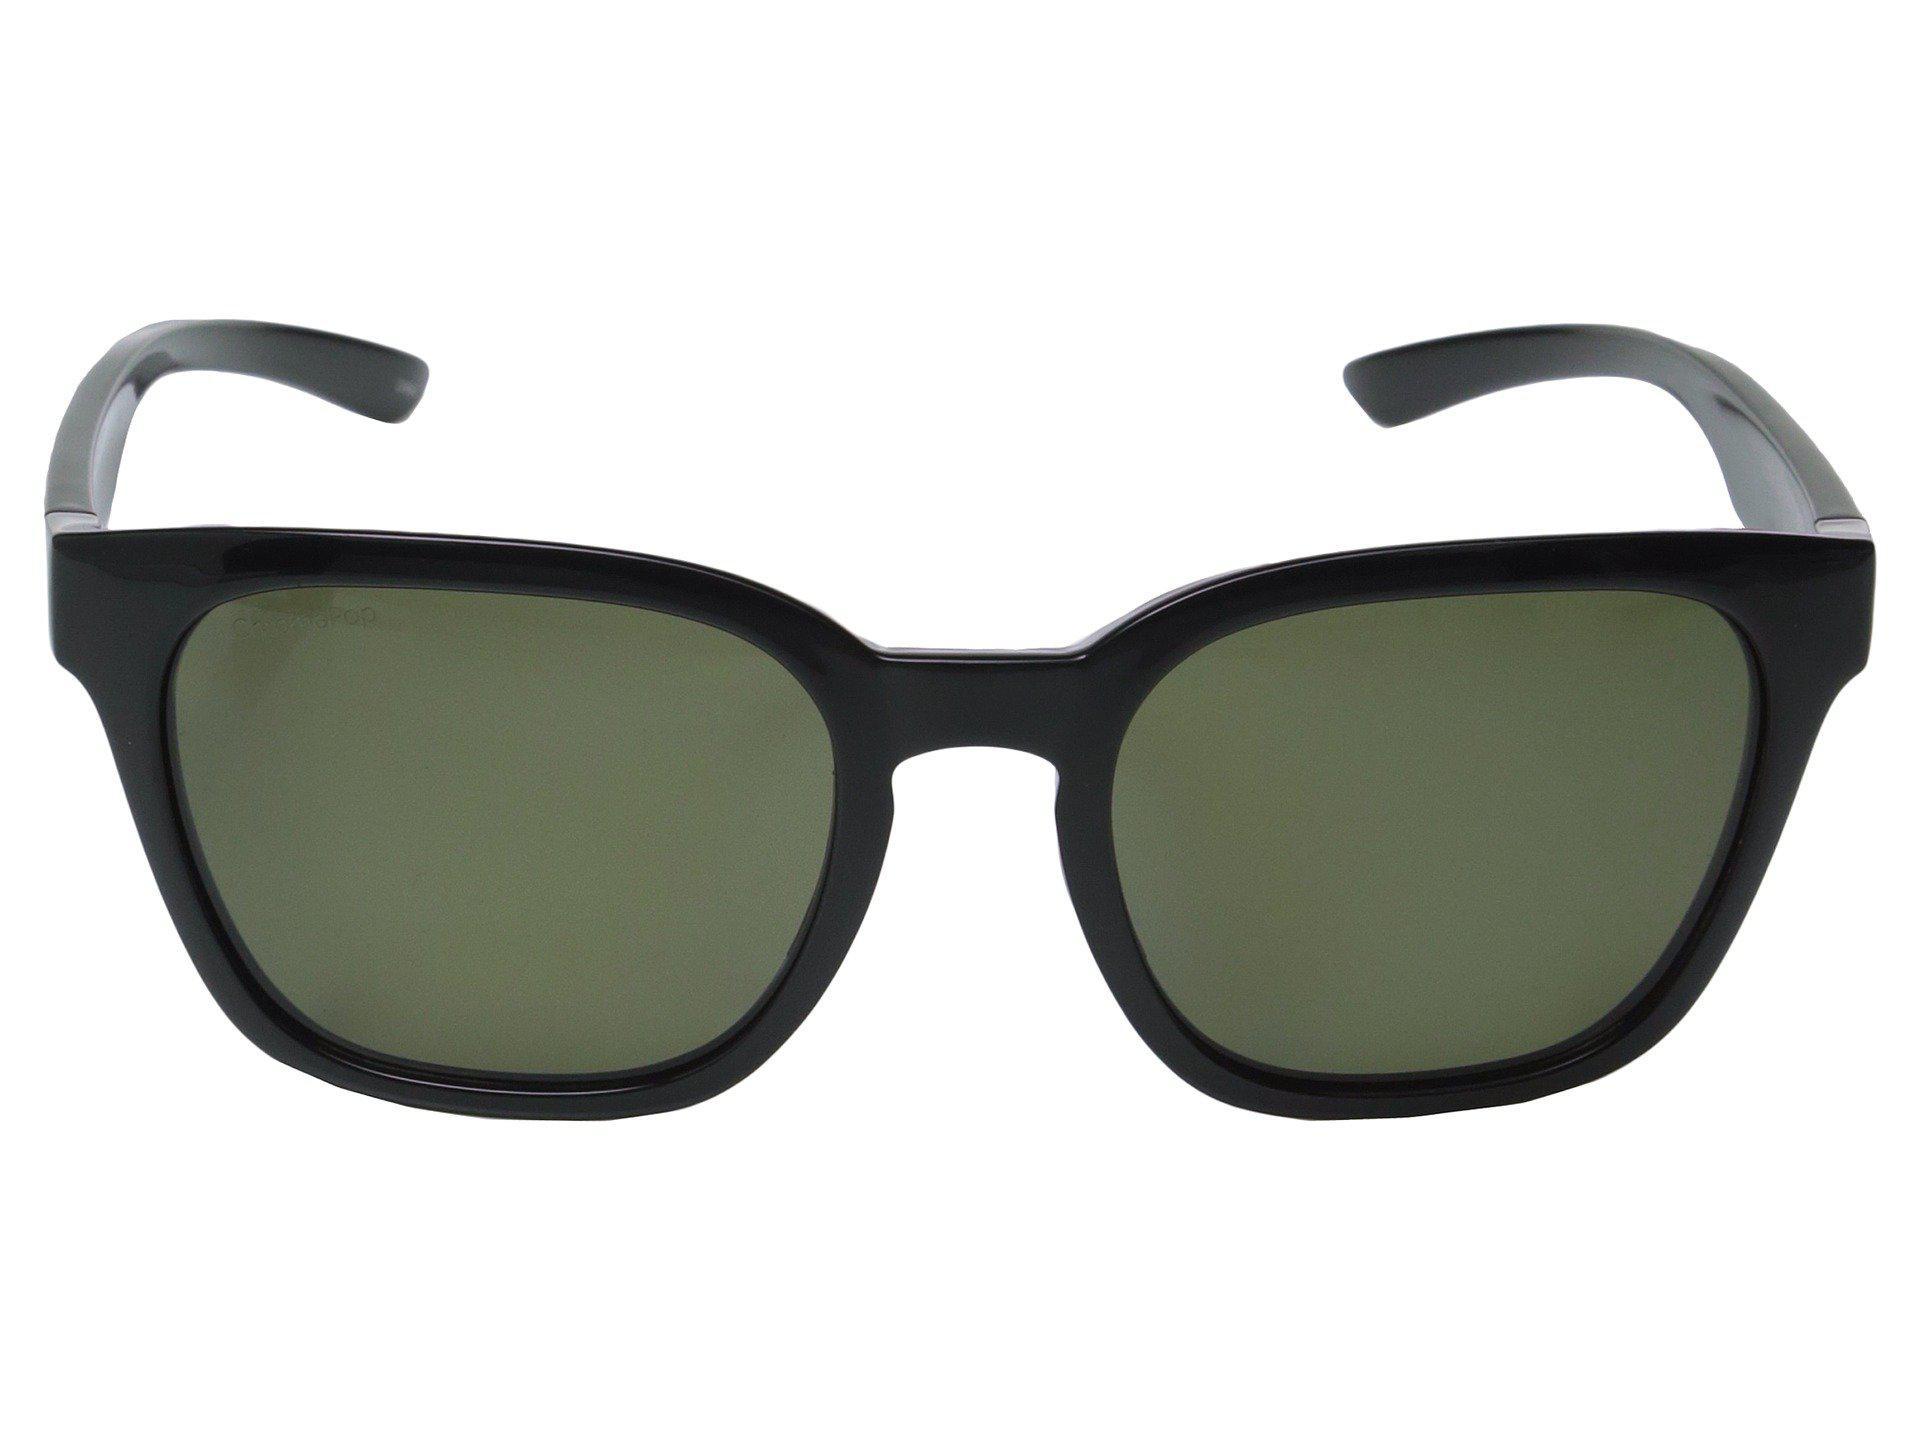 Smith Optics Founder Slim (black/polarized Gray/green